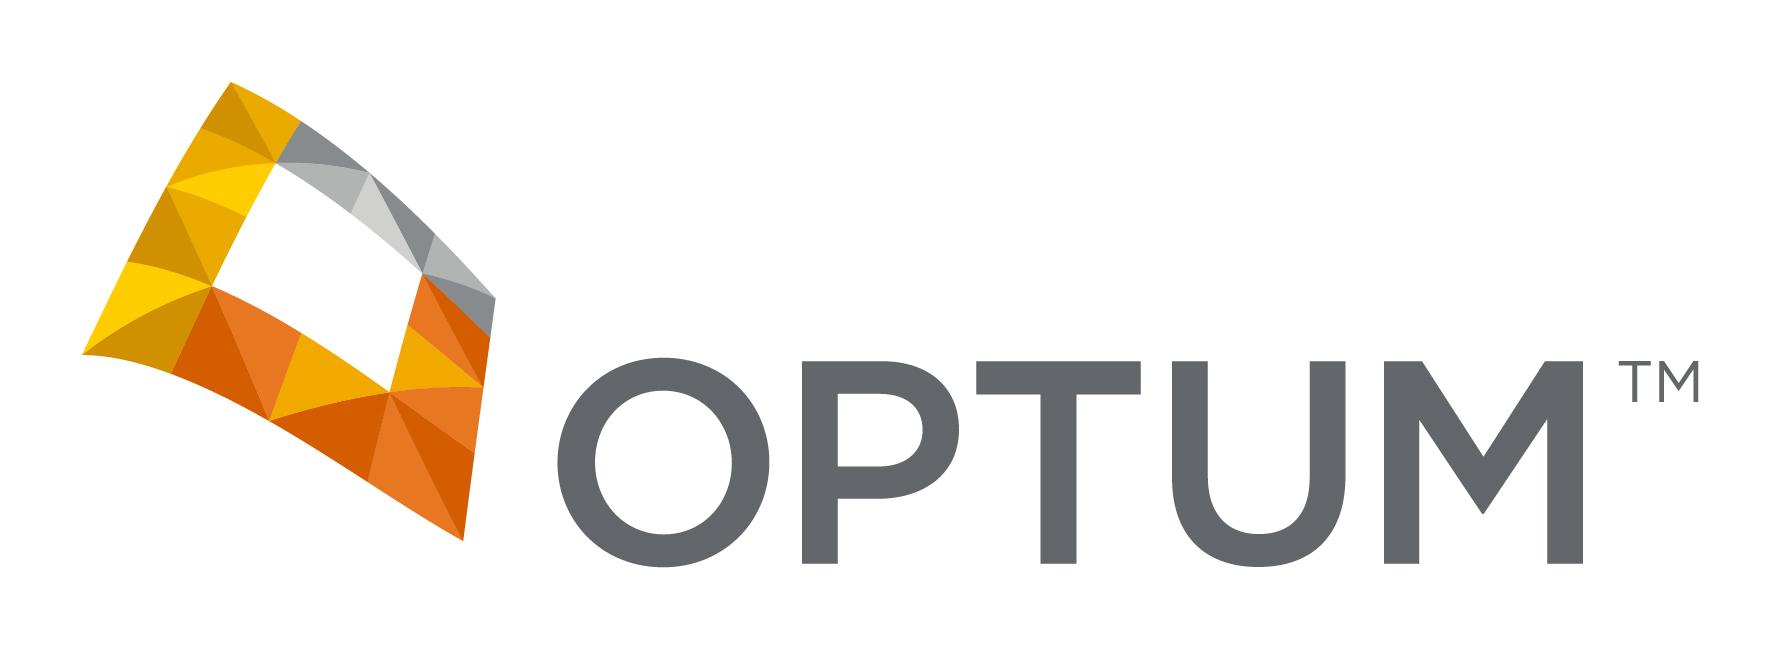 OPTUM_RGB_3 Logo.jpg